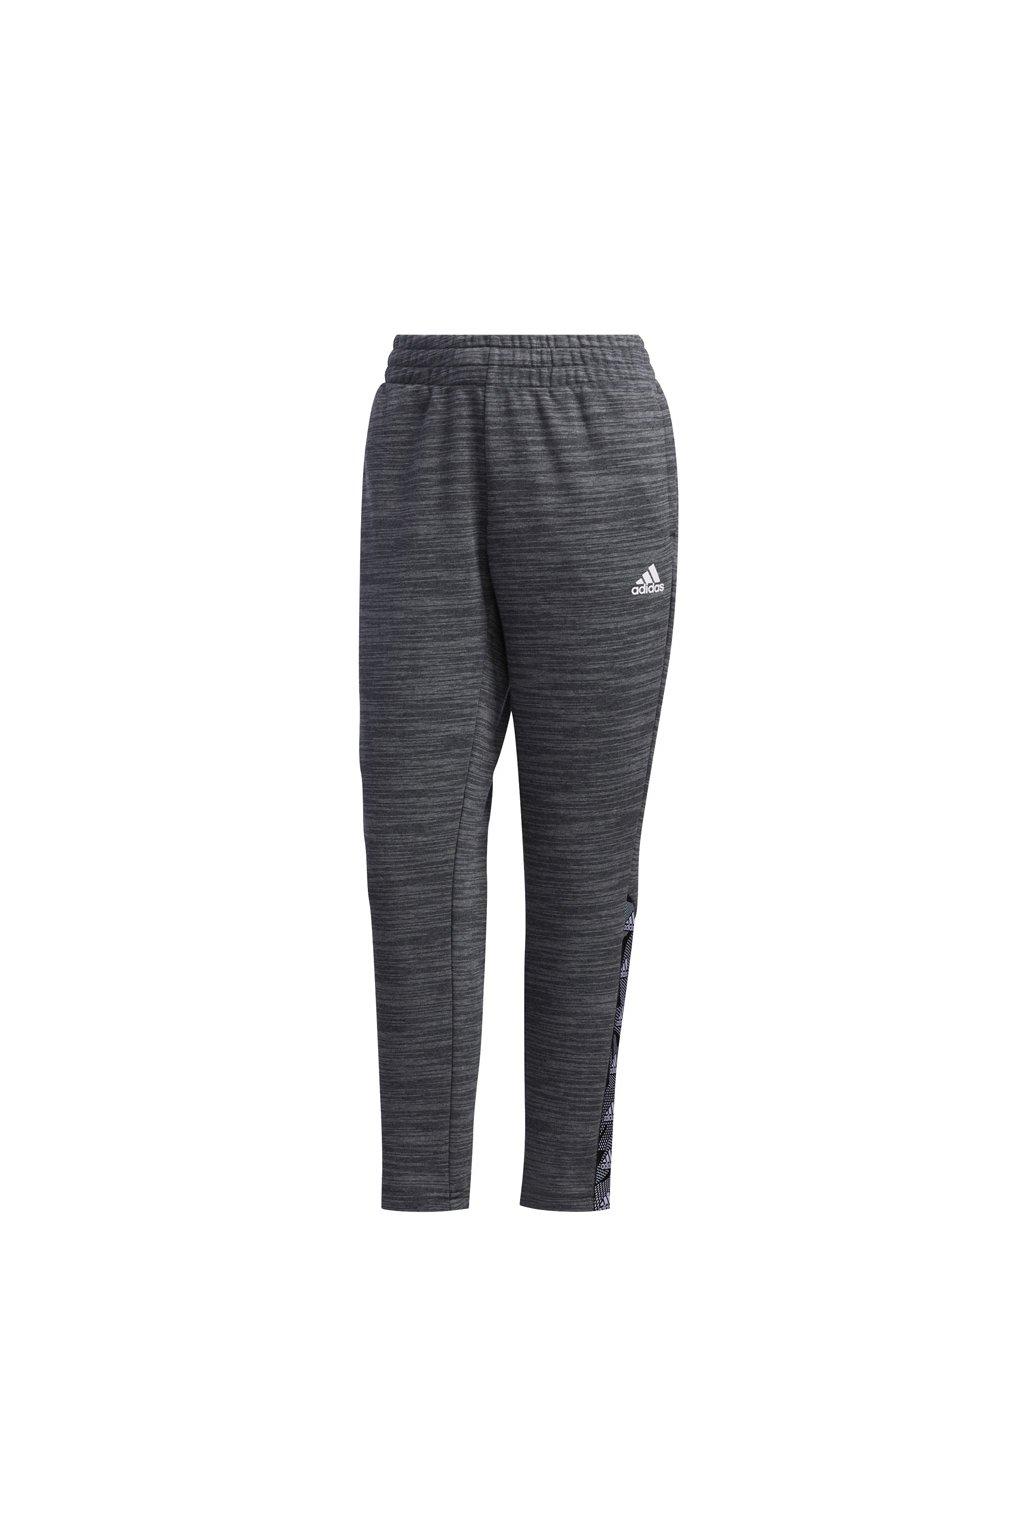 Dámske tepláky Adidas Essentials Tape Pant sivé GE1132